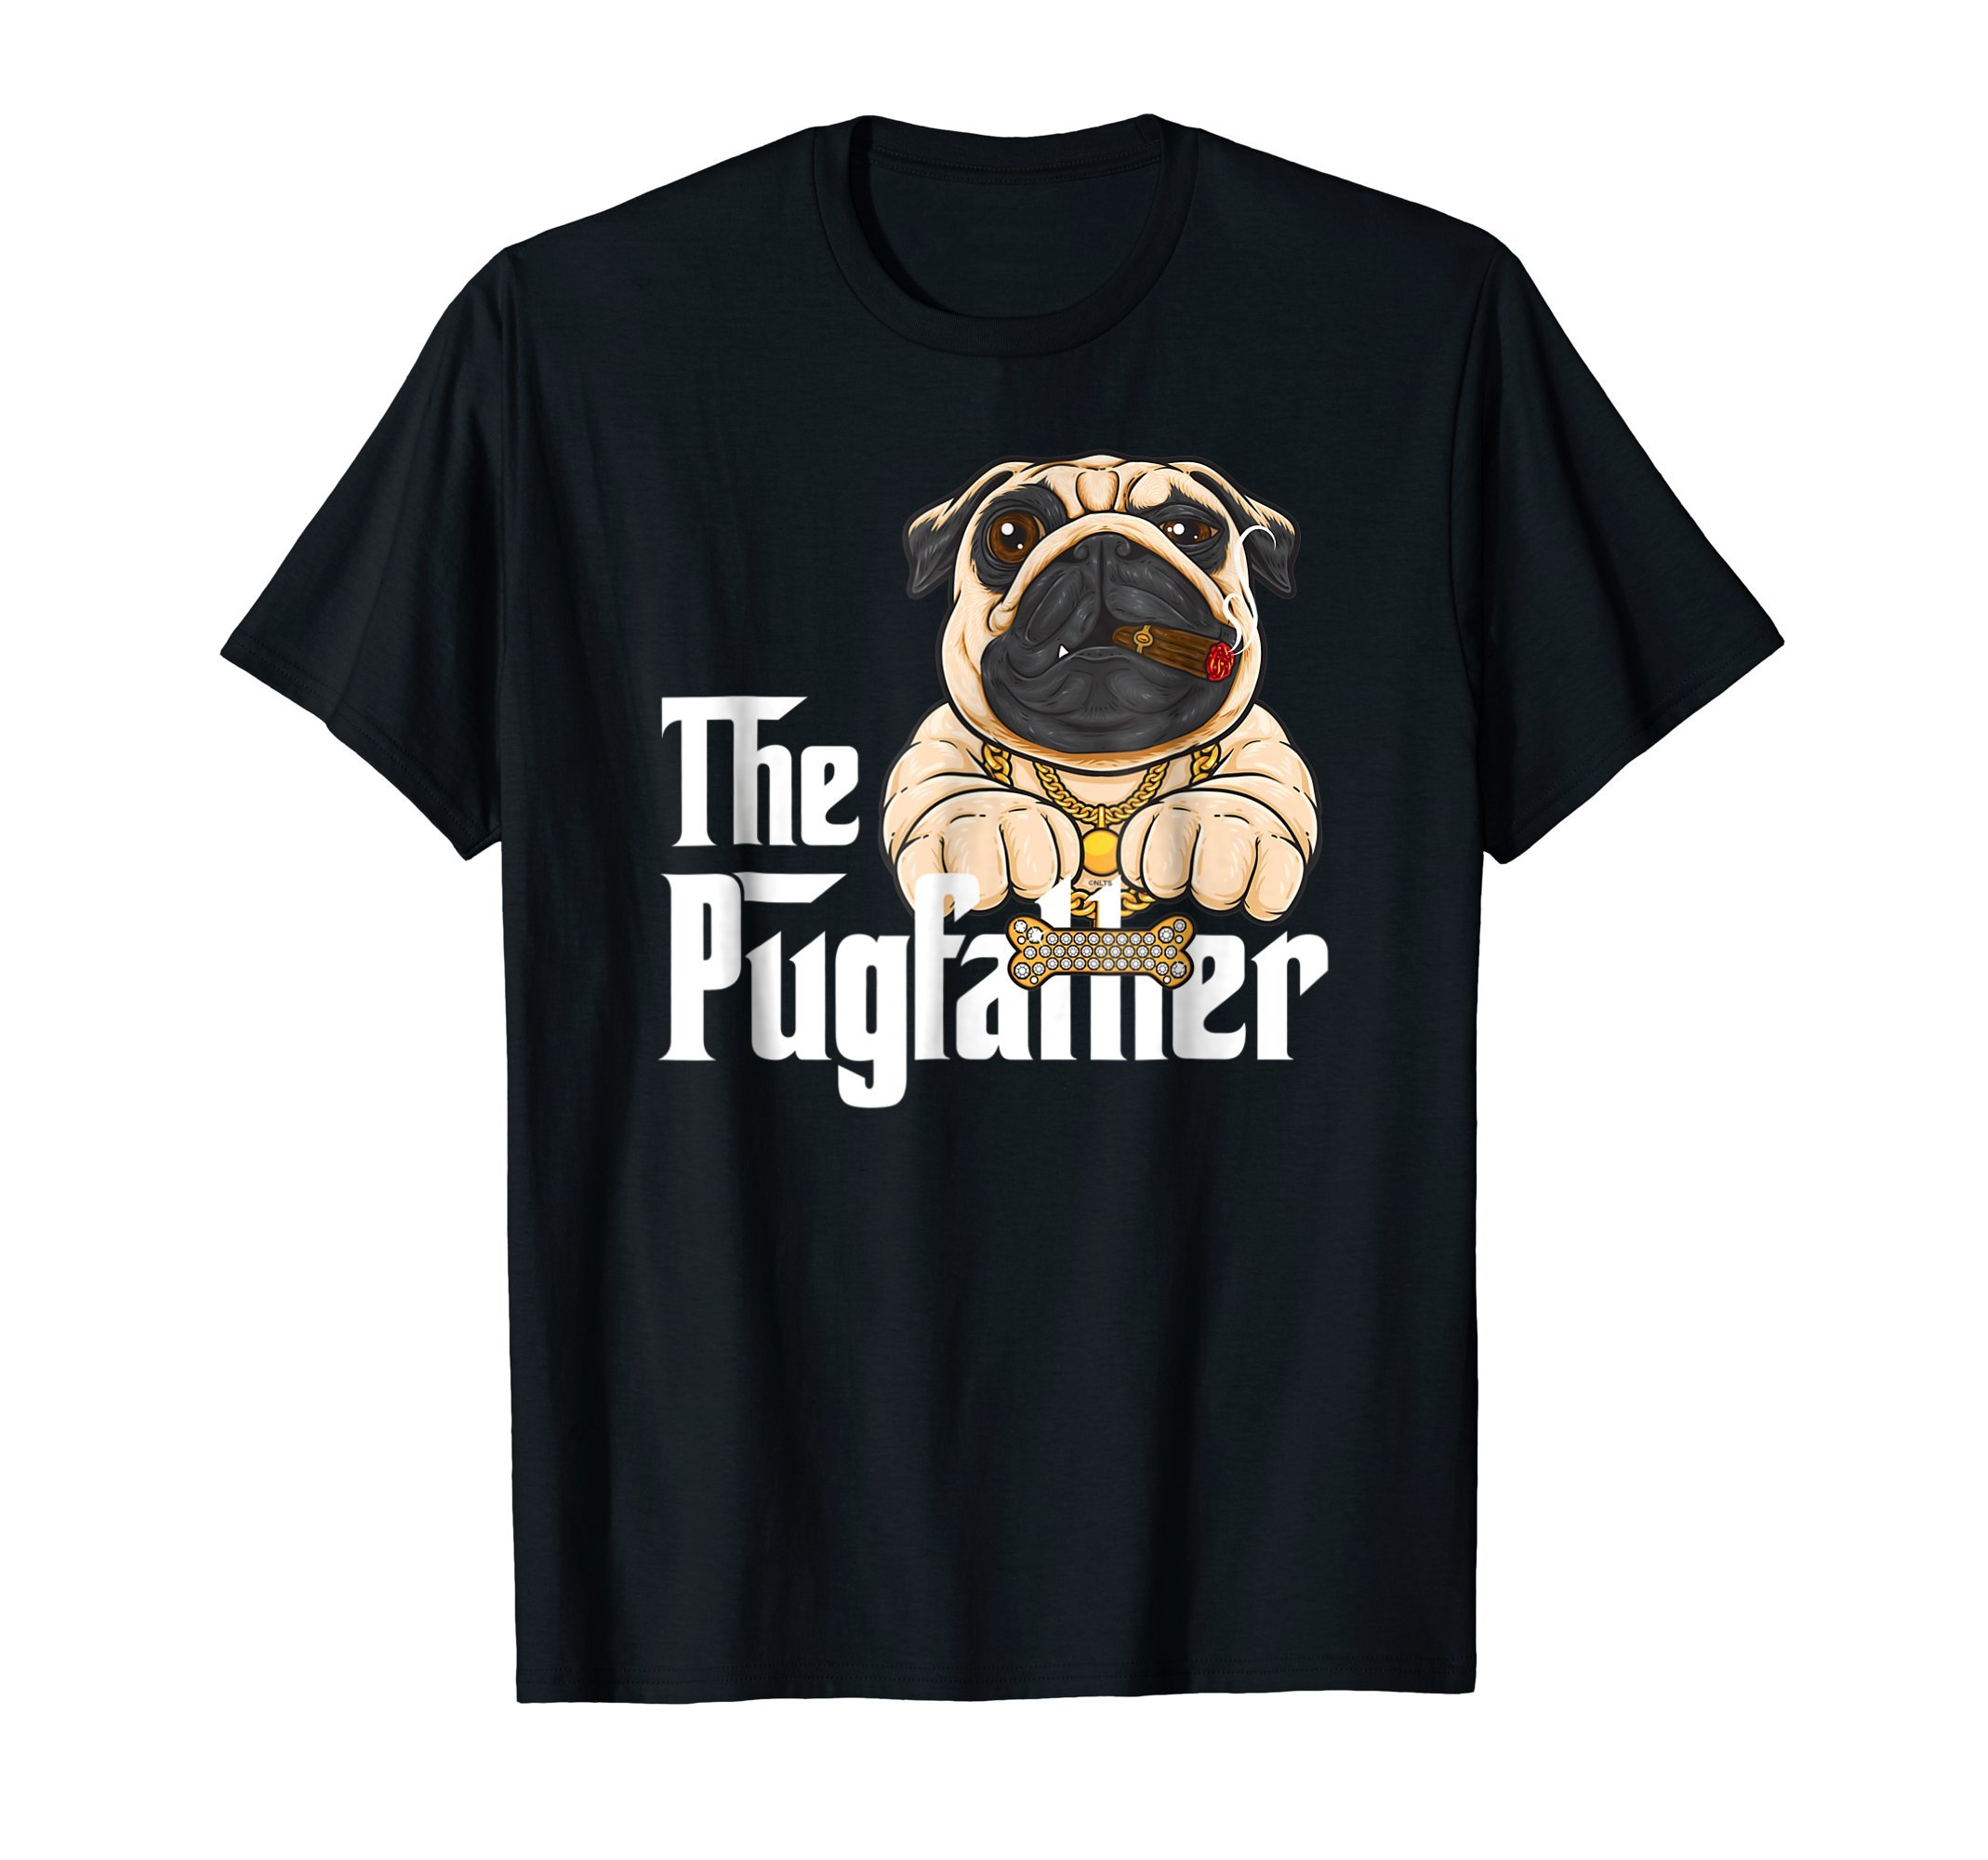 The-Pugfather-Gansta-Funny-Humor-T-Shirt-Shirt-Tee-Gift